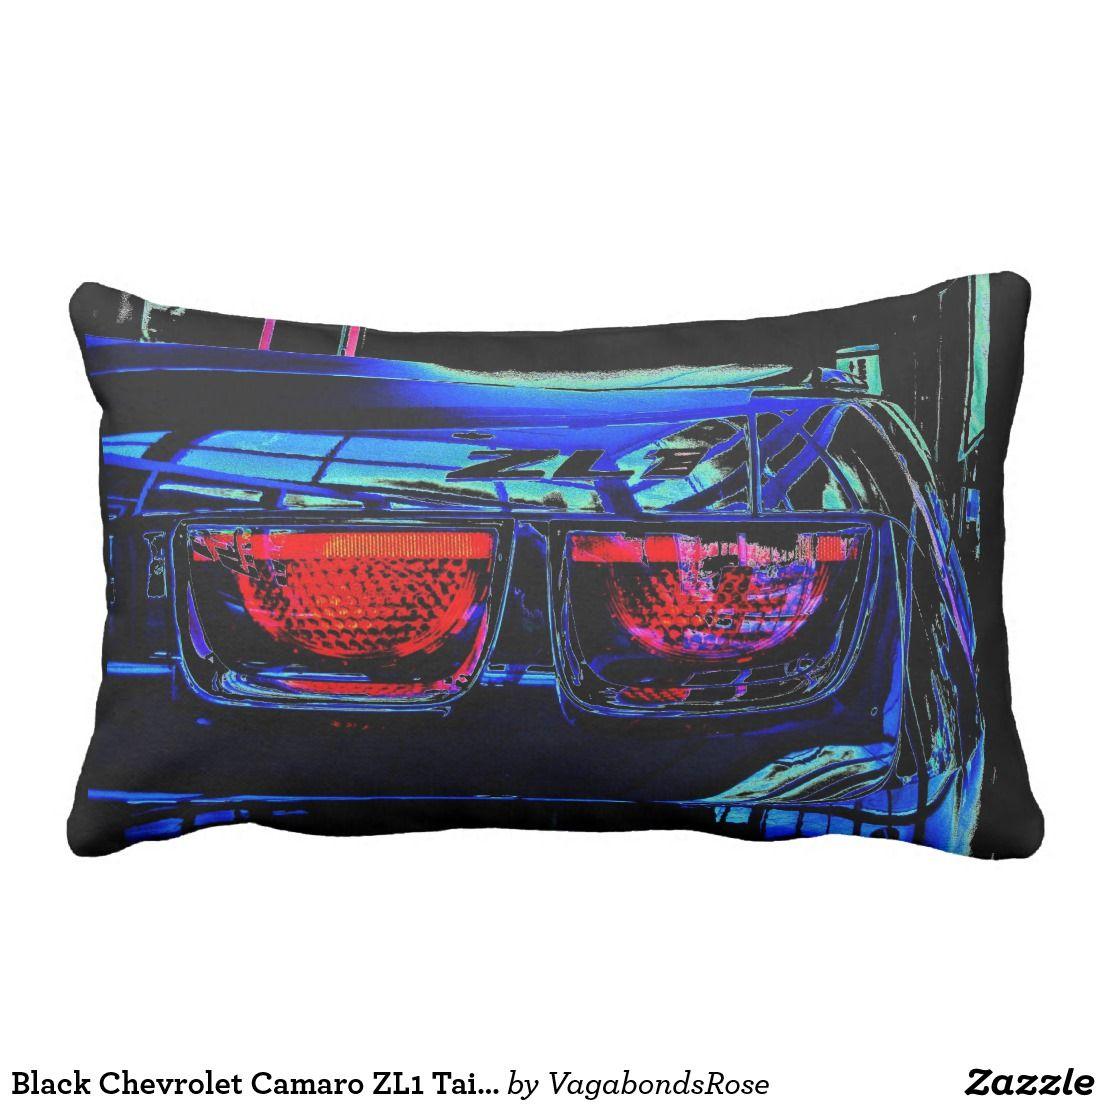 Black Chevrolet Camaro ZL1 Tail Lights And Decal Lumbar